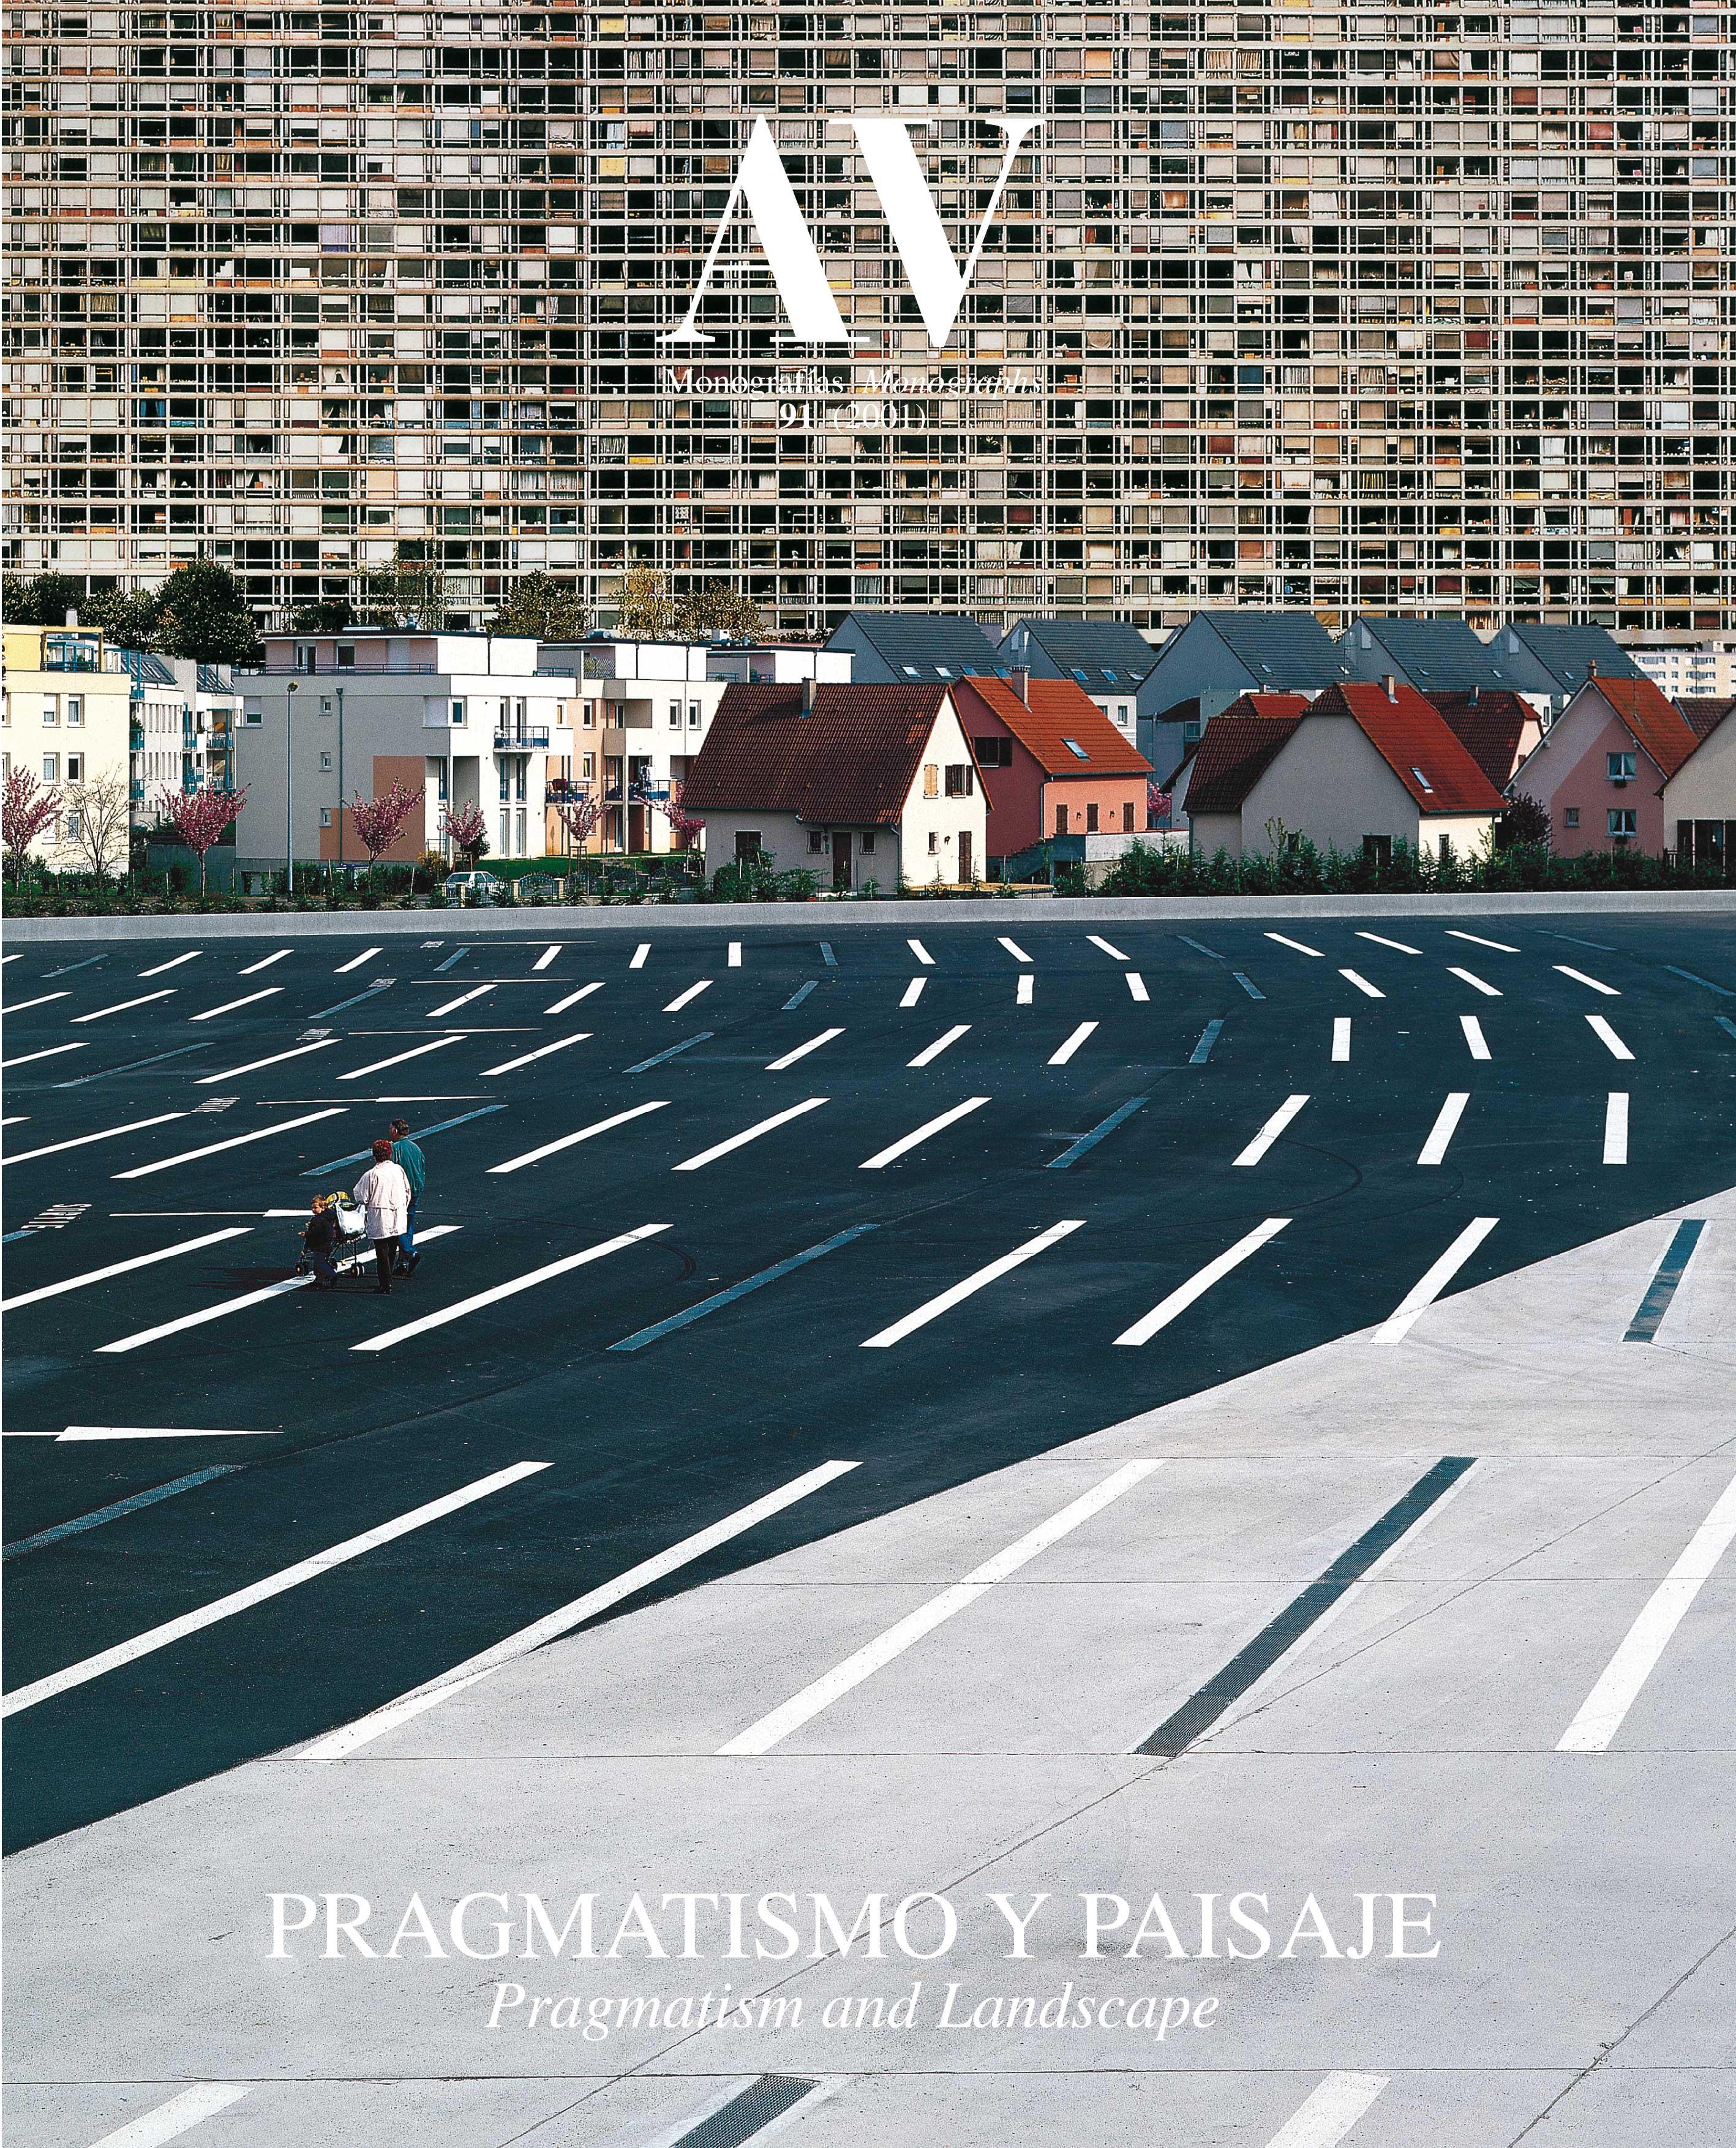 Pragmatism and Landscape